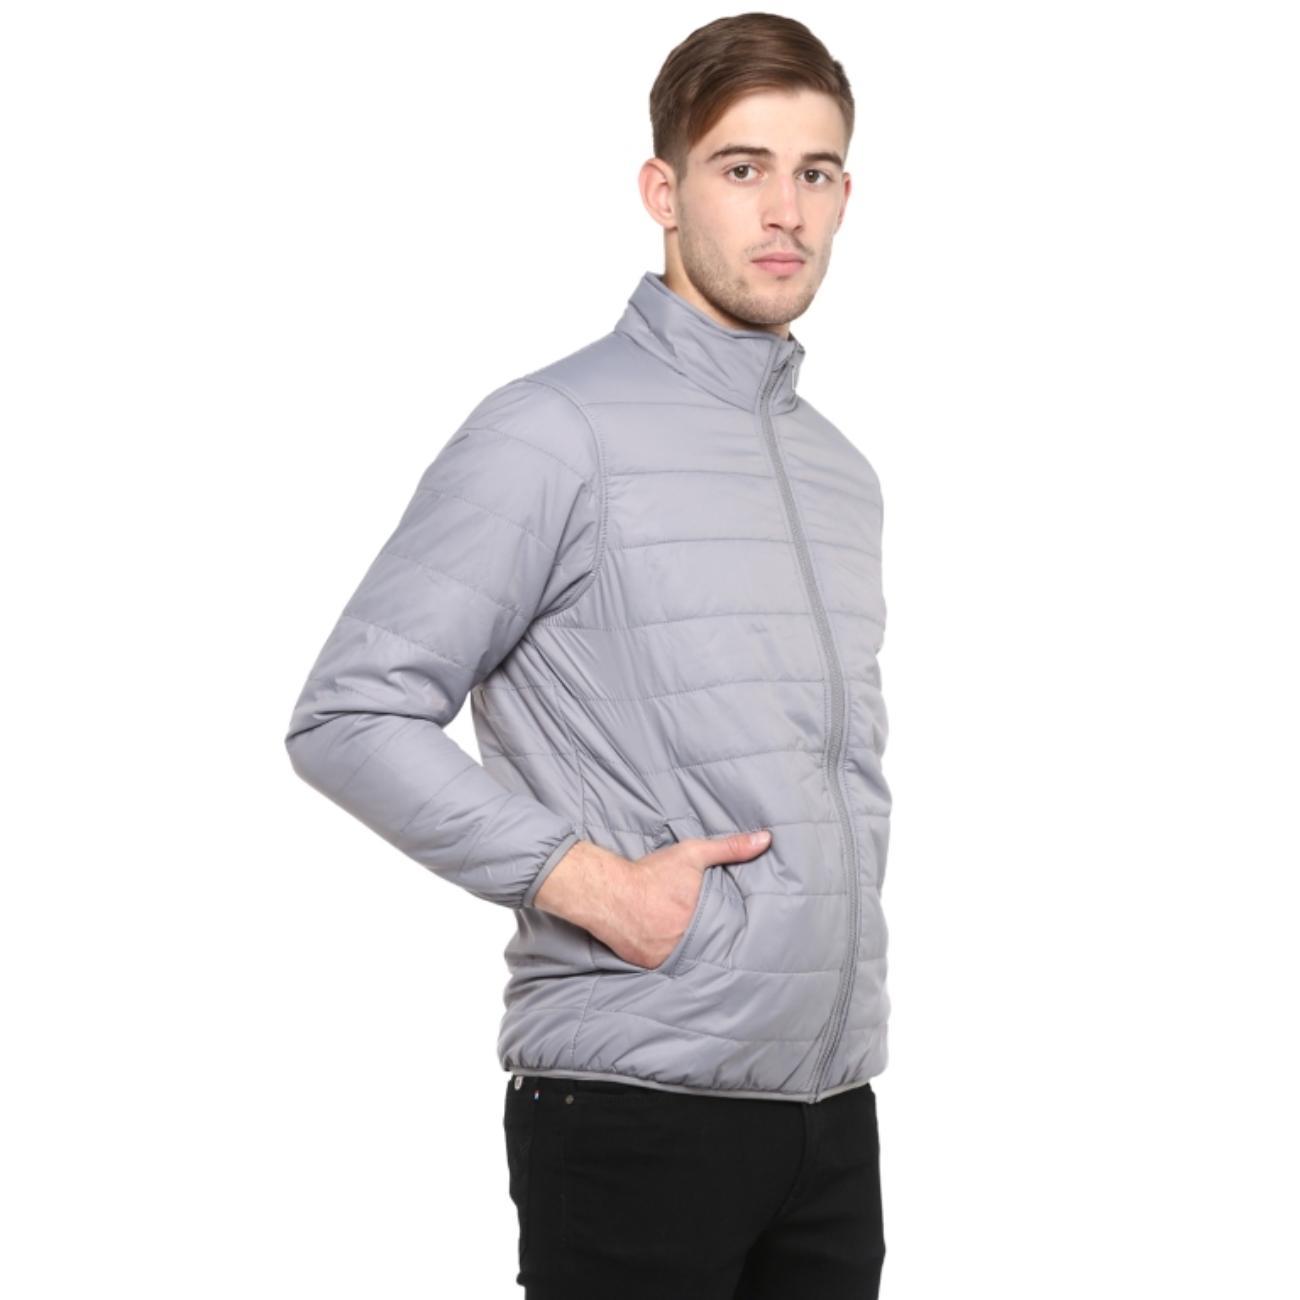 Purchase Men's Light Gray Jacket